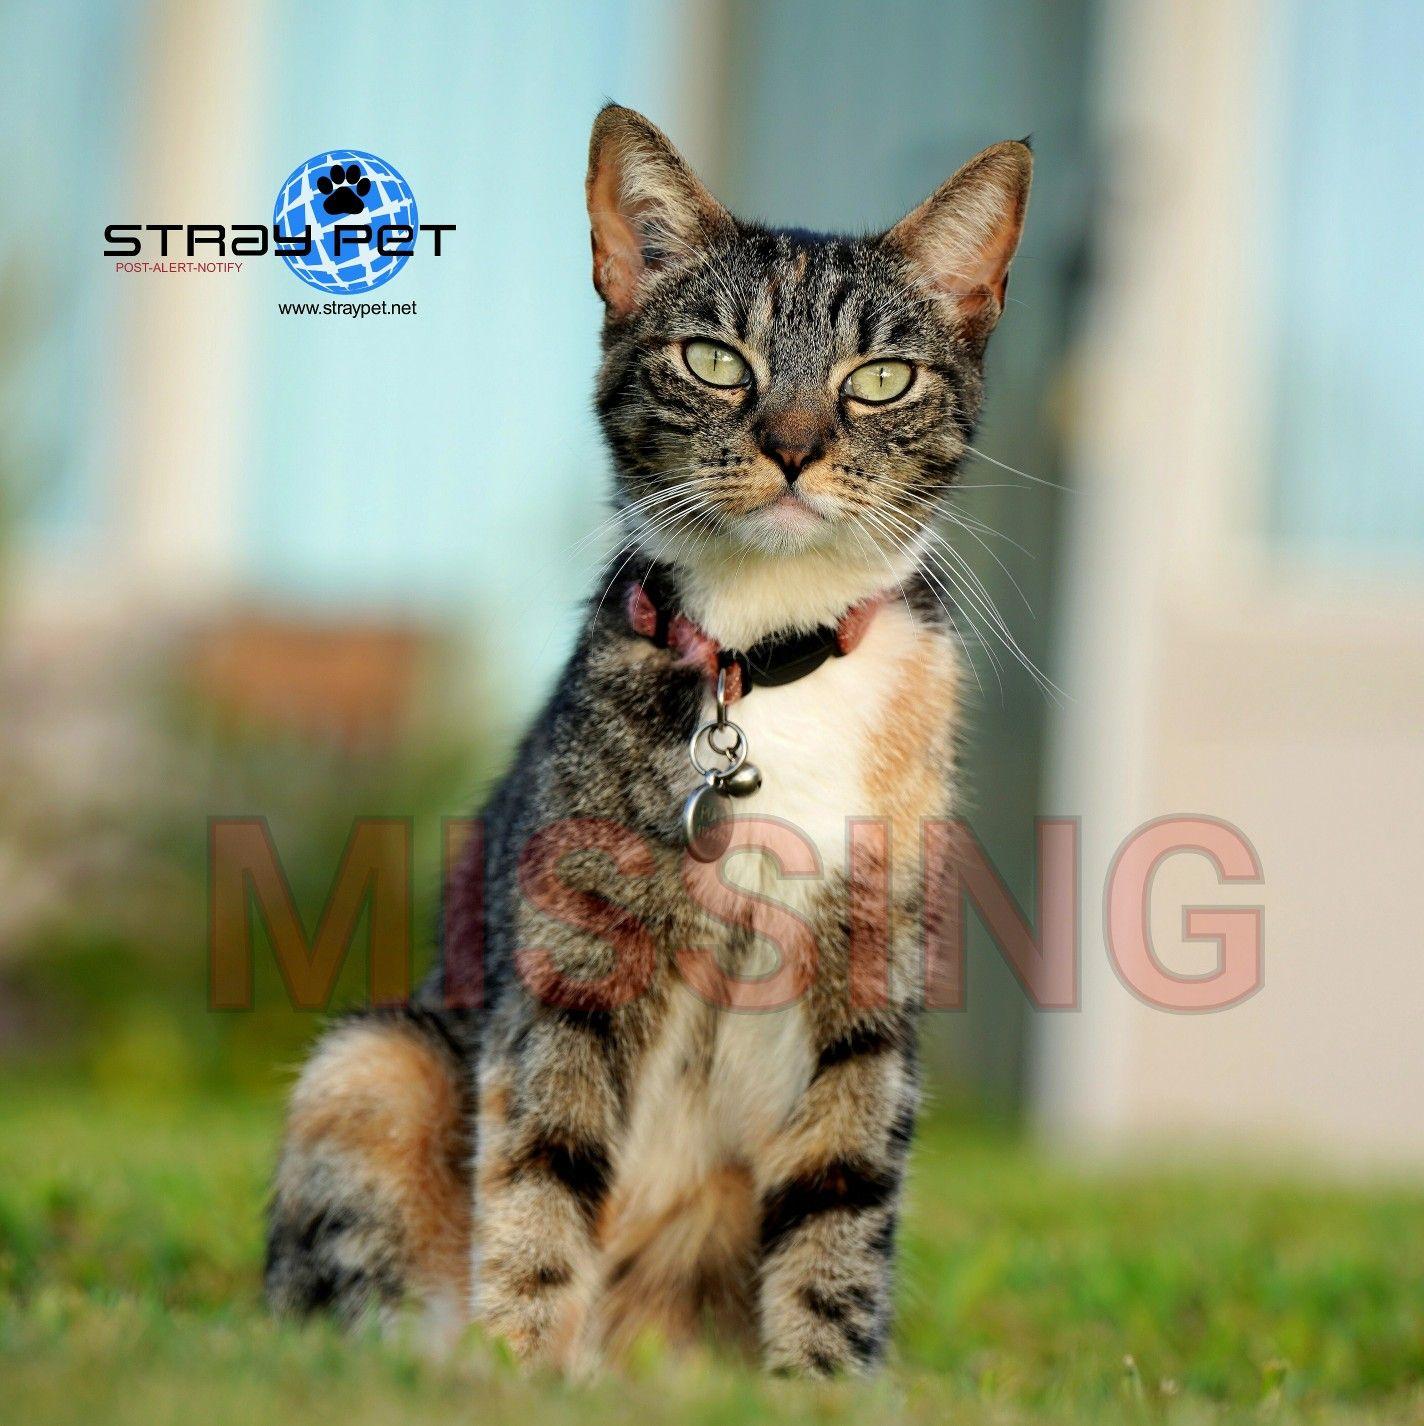 Stray Pet Alert Missing Tiger Stripe Cat Kaanapali Hi 96761 Straypethawaii Lost Dog Lostpuka Https Straypet Net Pet Name Puka Age Pets Cats Animals